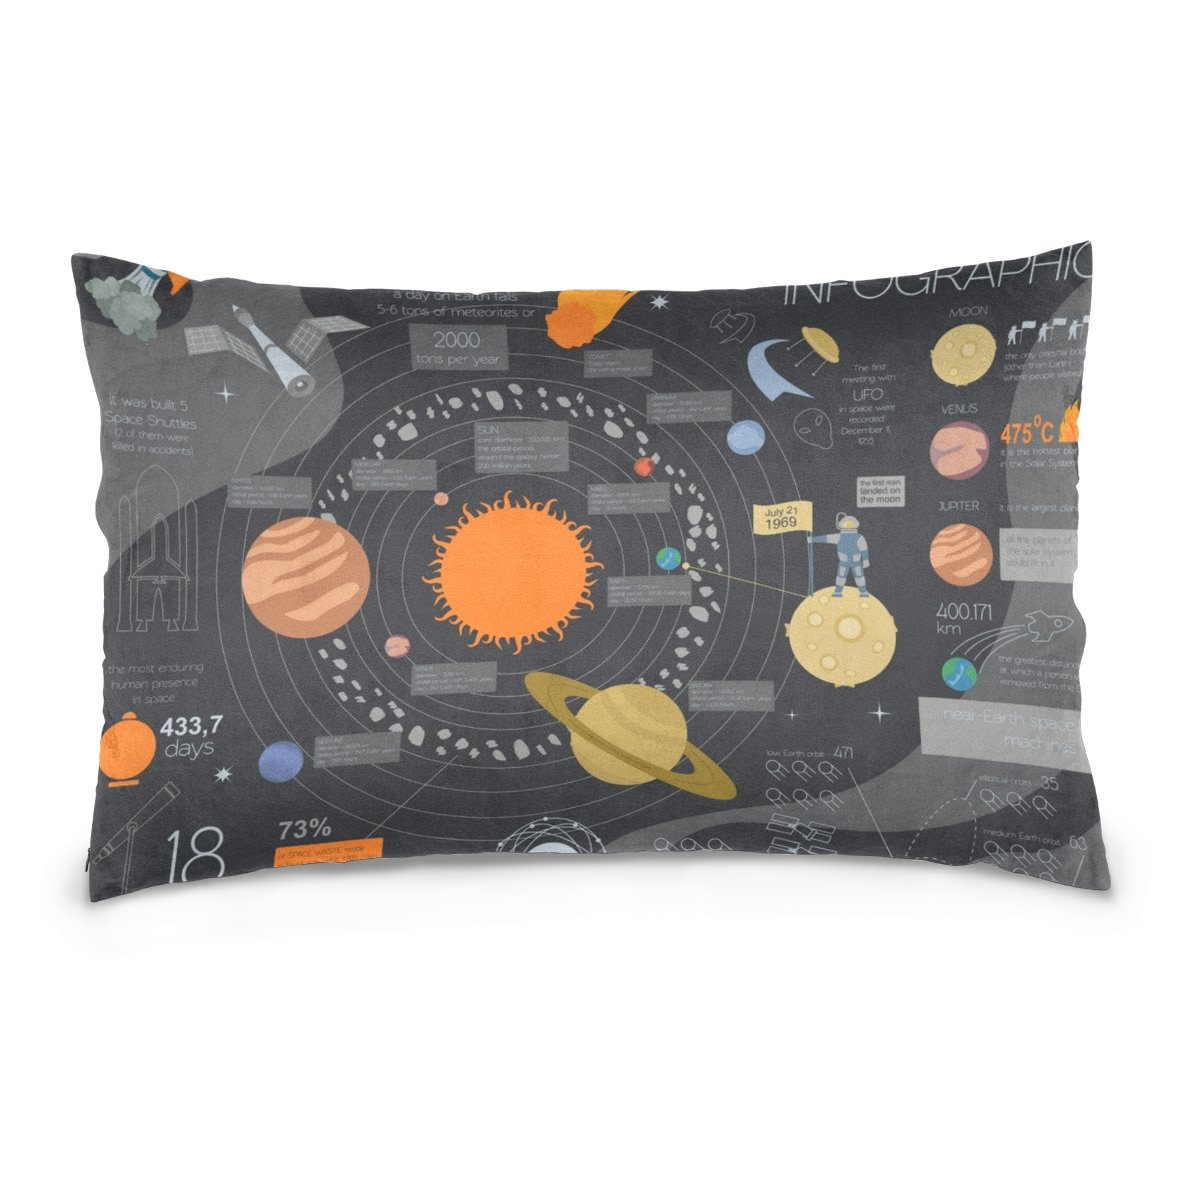 Cooper girl Universe Solar System Pillow Case Sofa Bed Throw Pillow Cover Cotton Zipper 20x26 Inch